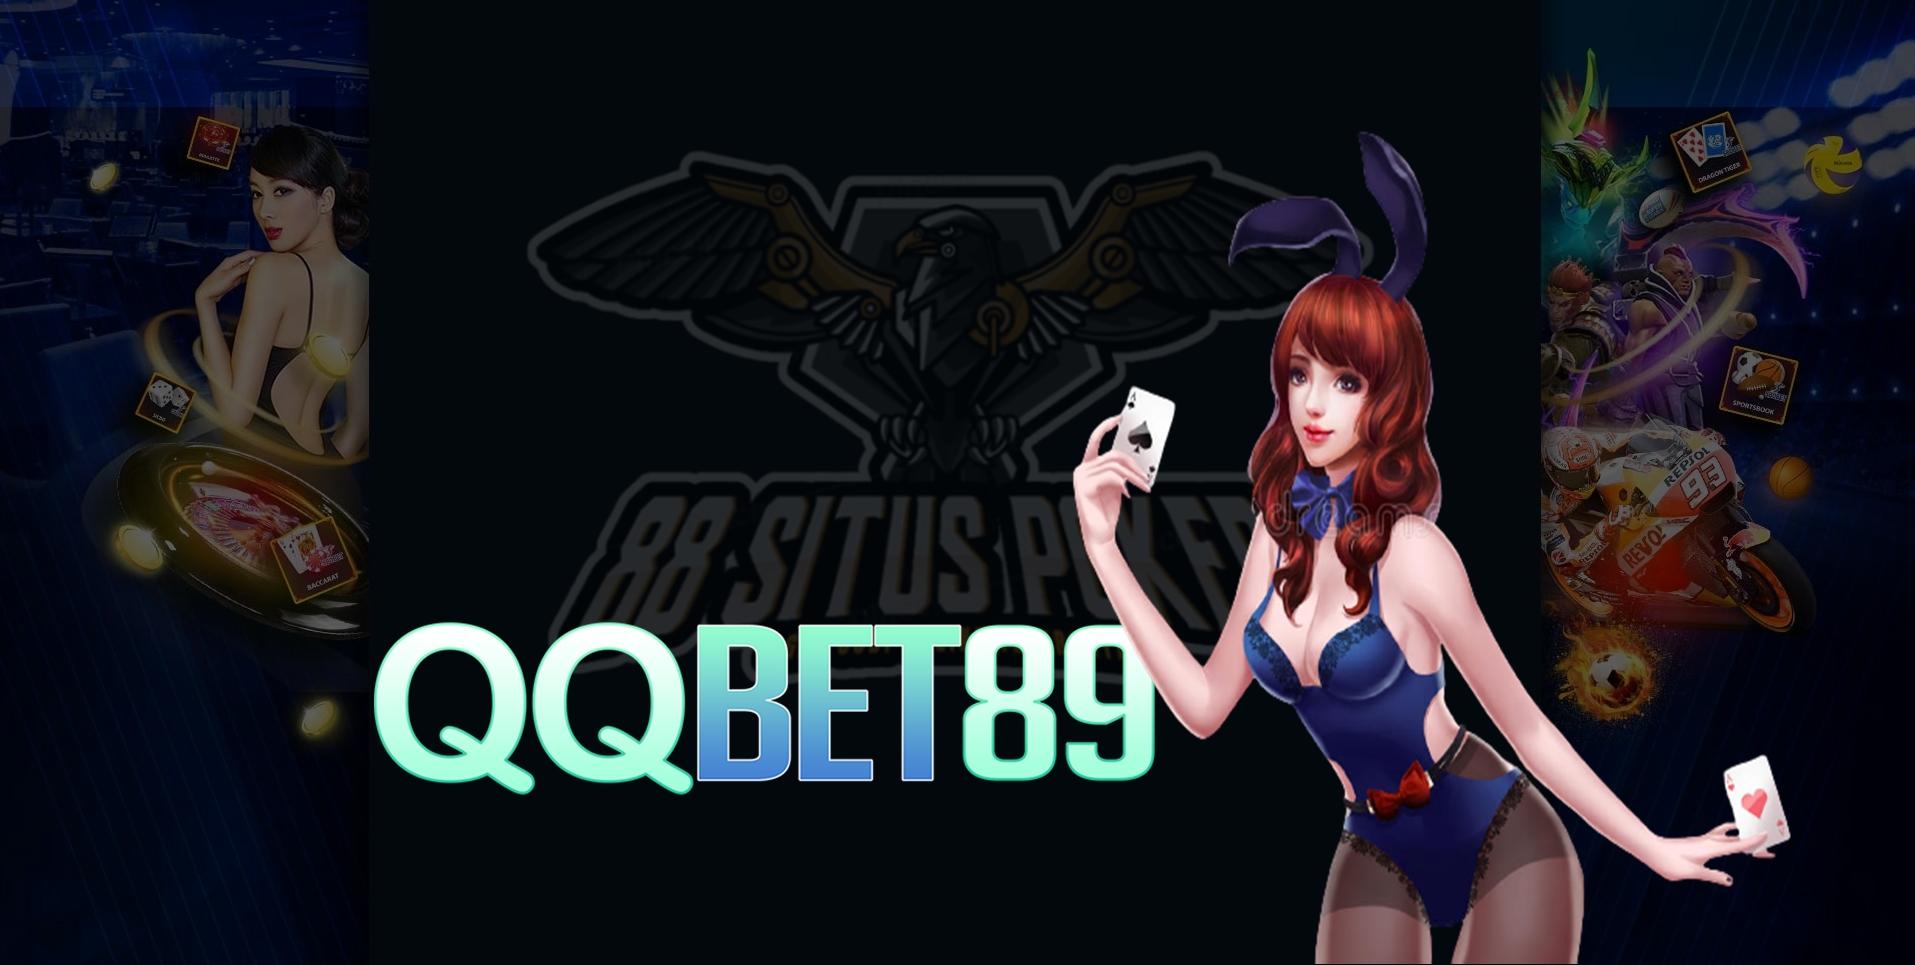 Daftar Situs Judi Online Slot Indonesia Terpercaya - QQBet89